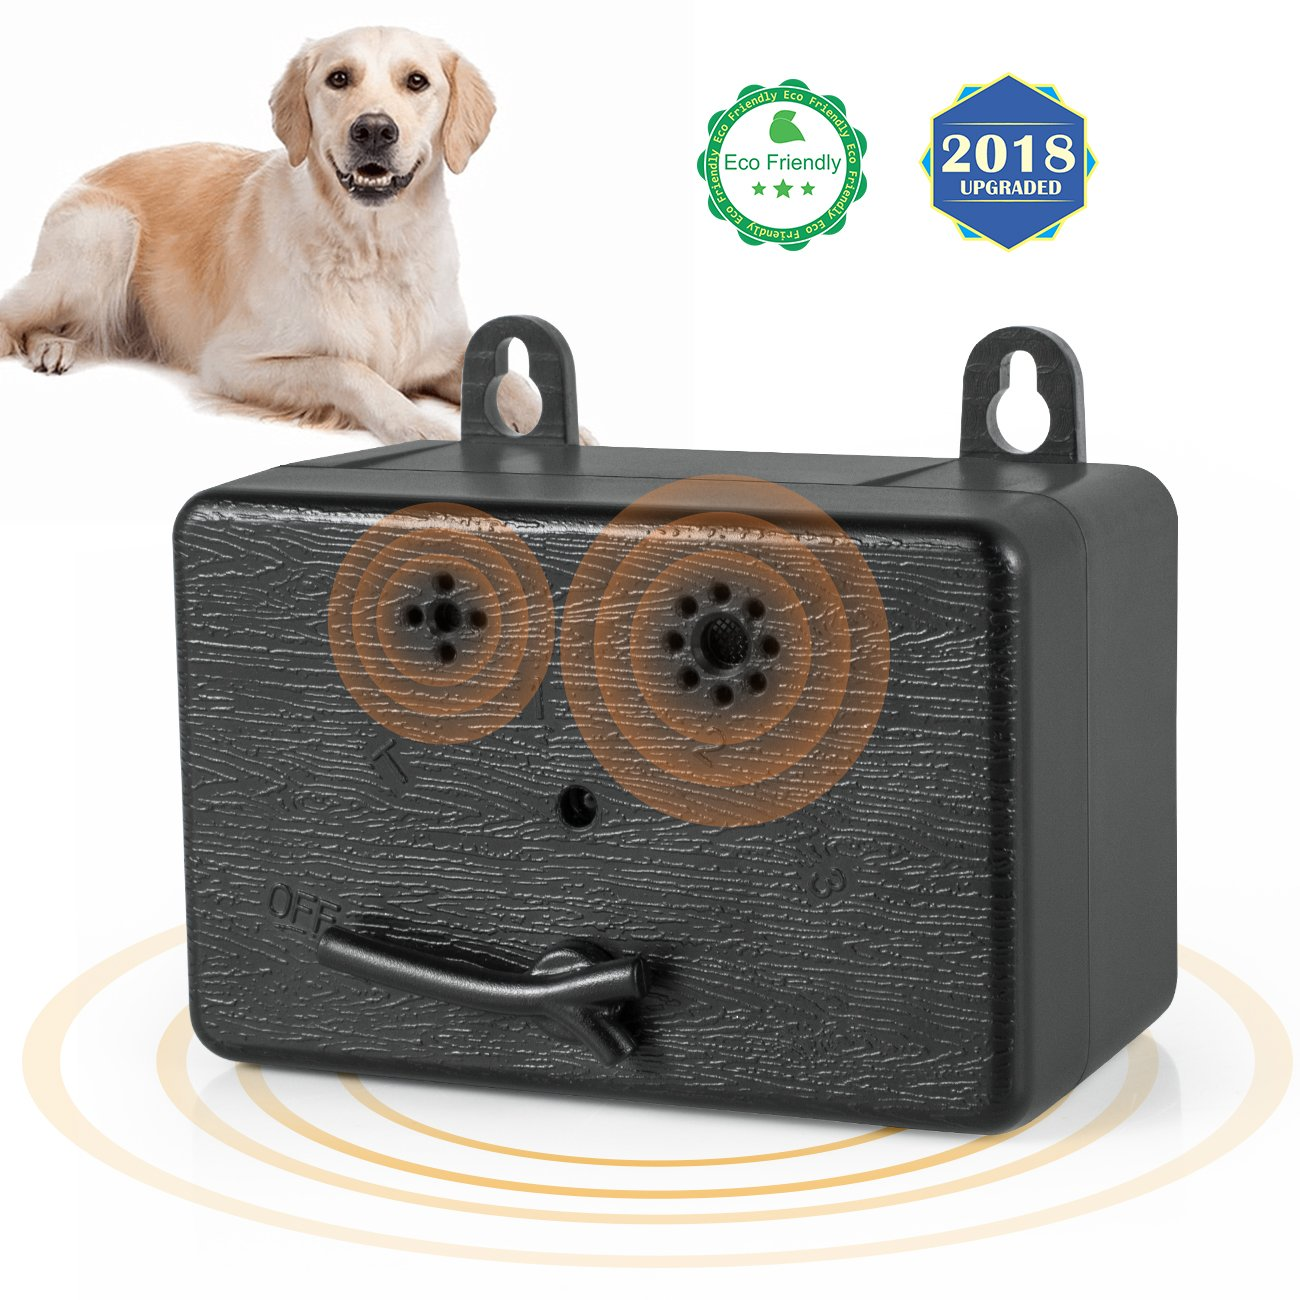 ShamBo Anti Barking Device, Mini Bark Control Device Outdoor Anti Barking Ultrasonic Dog Bark Control Sonic Bark Deterrents Silencer Stop Barking Bark Stop Repeller, Dog bark Control (2018 New)